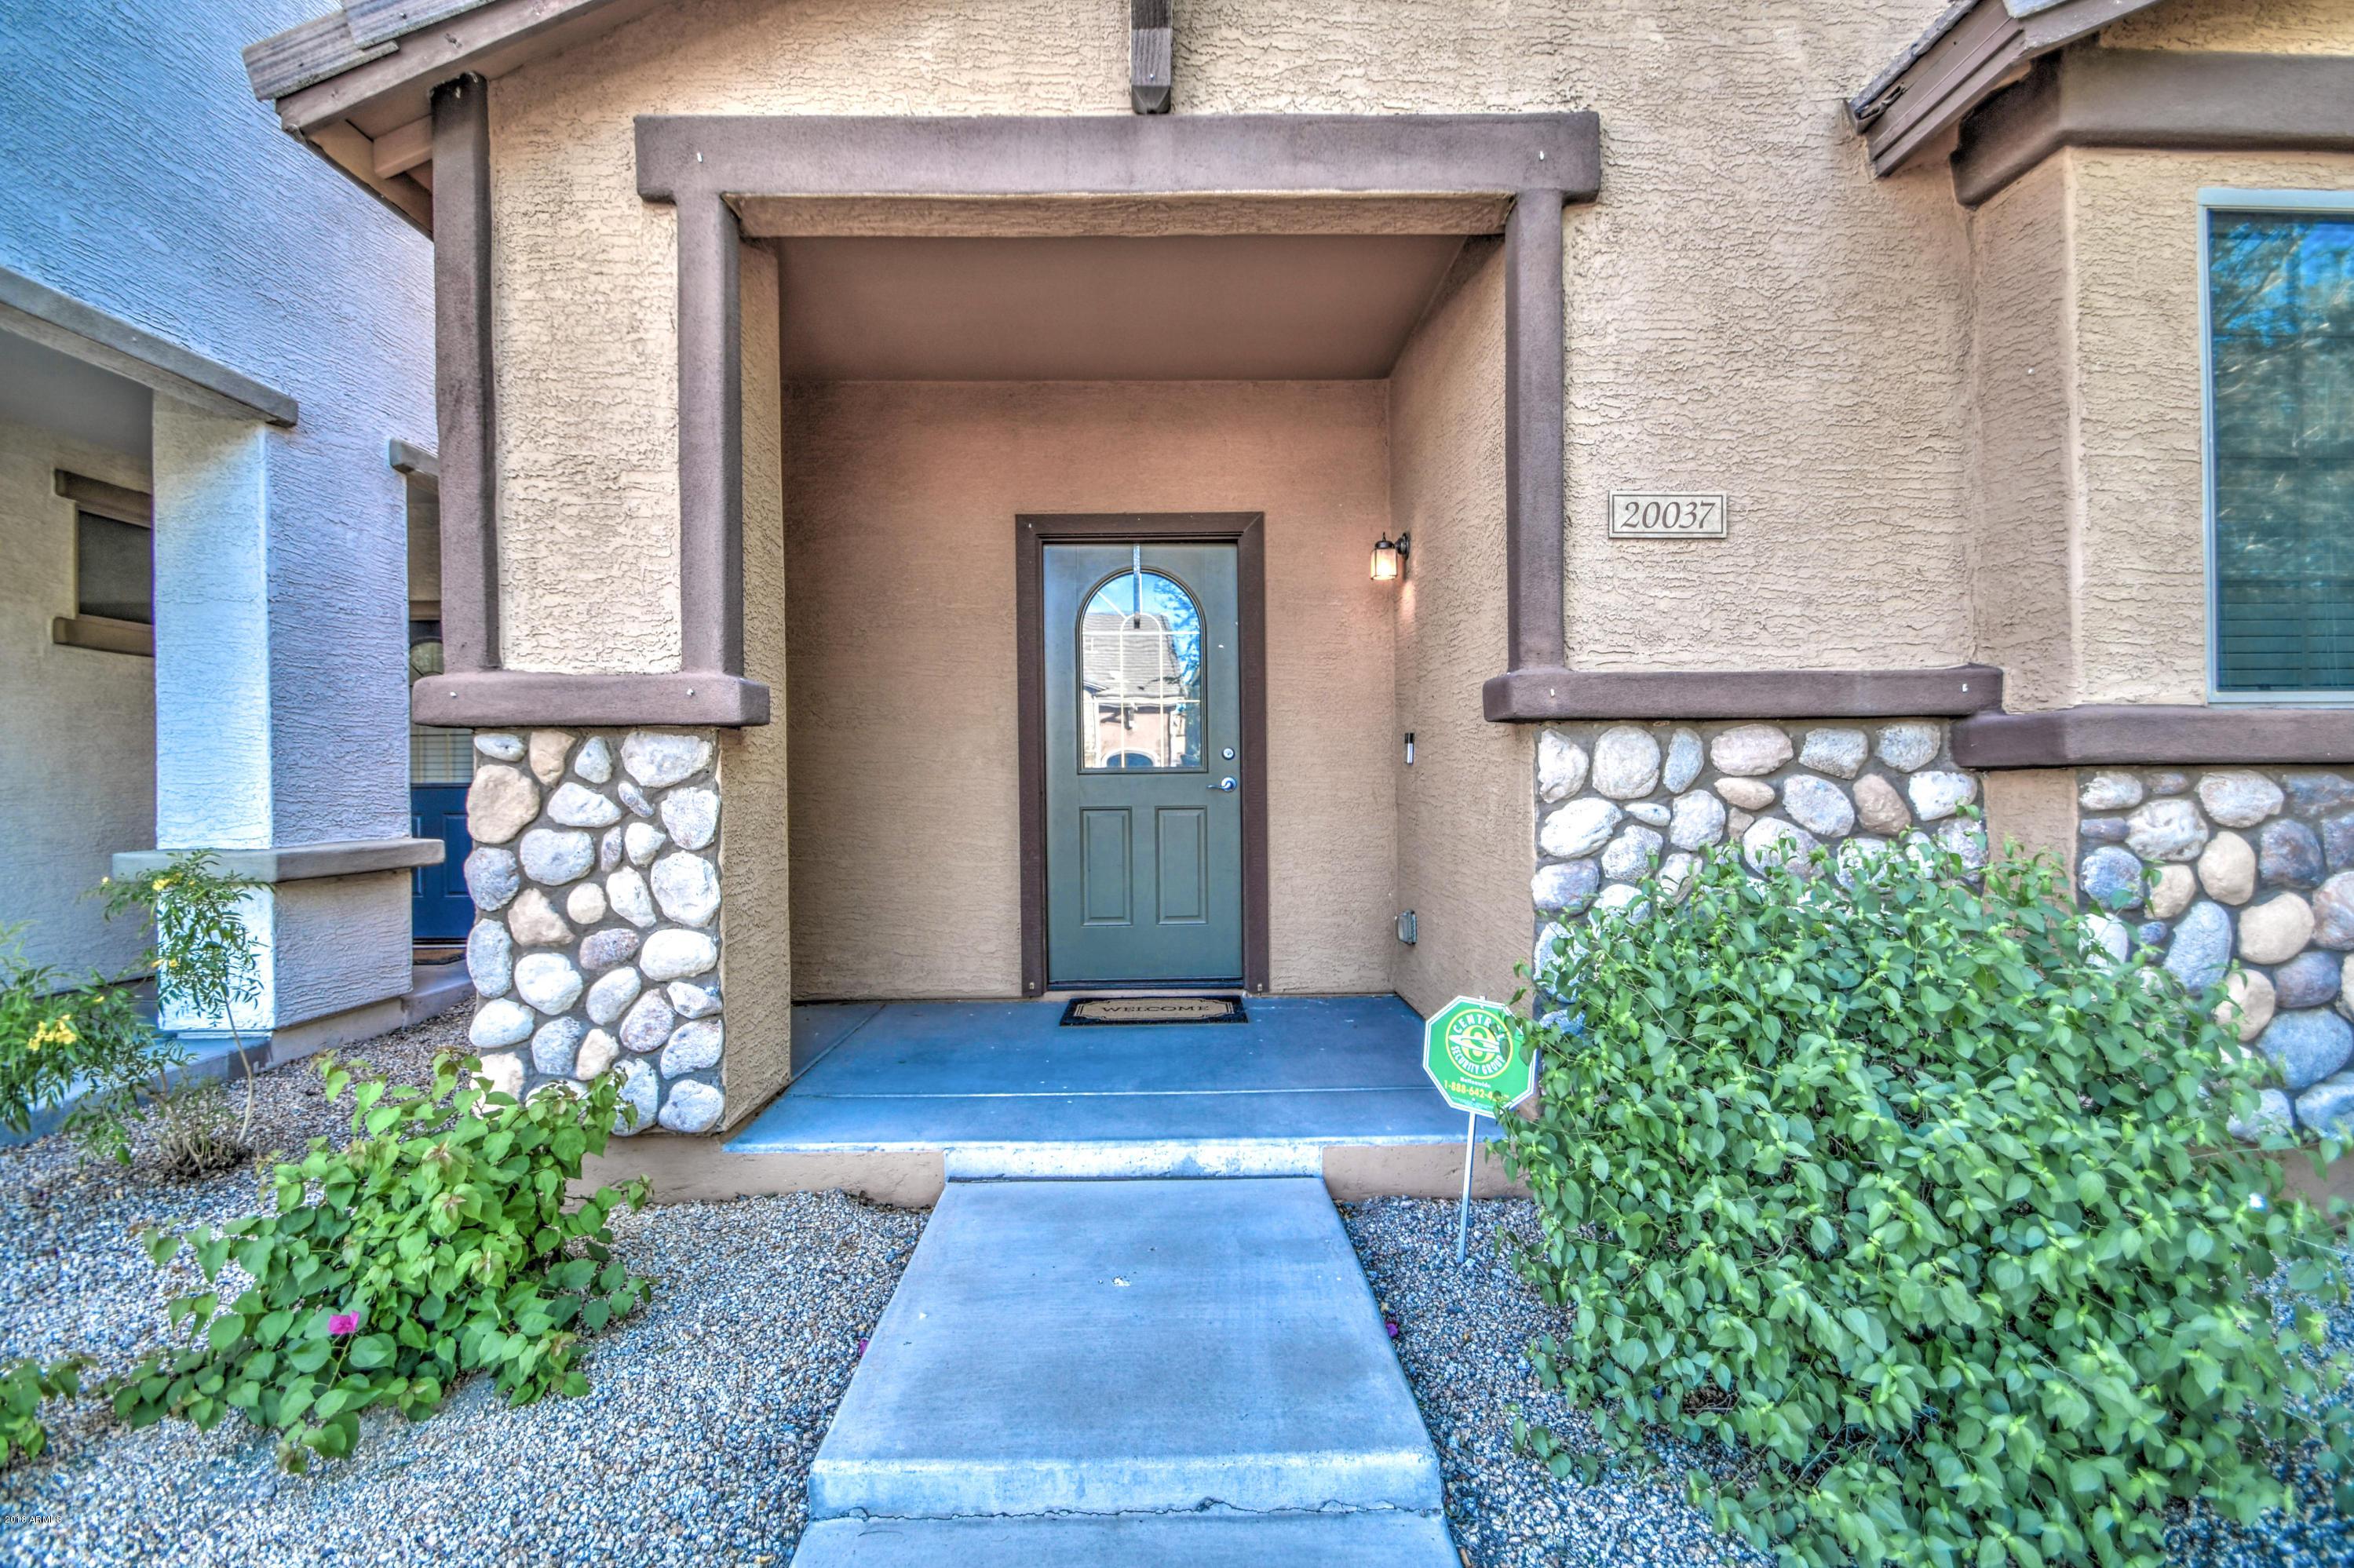 Glendale AZ 85308 Photo 3